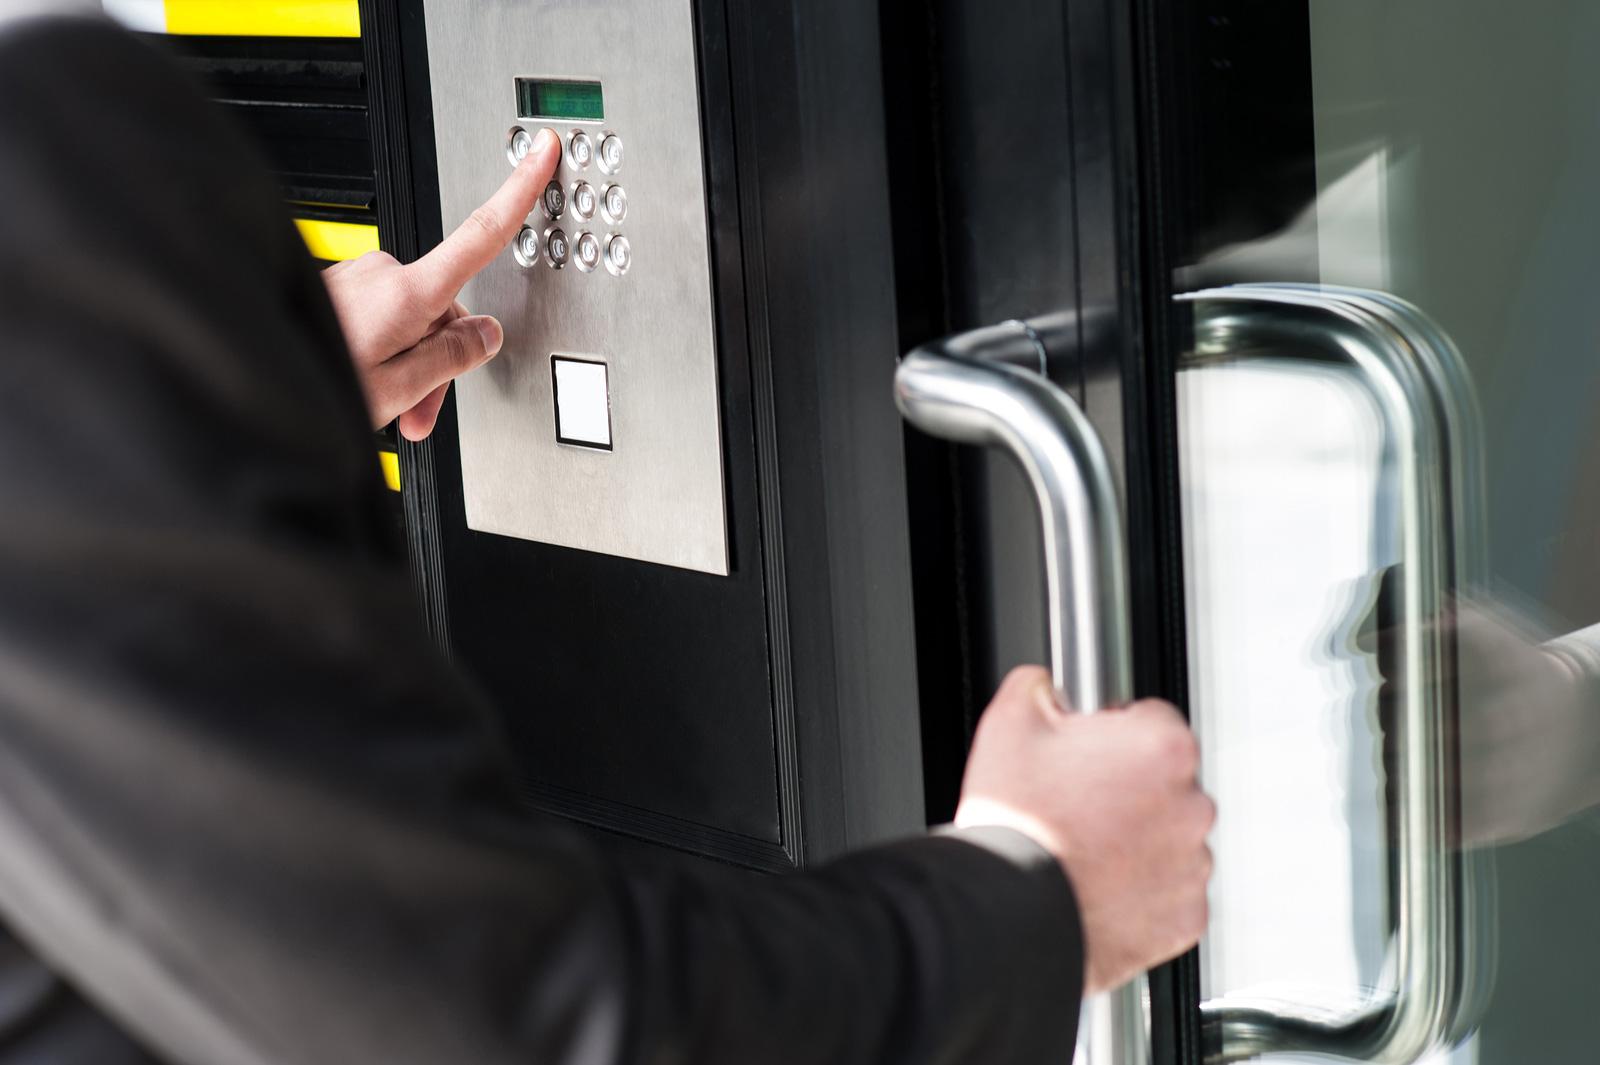 Employee Access Codes